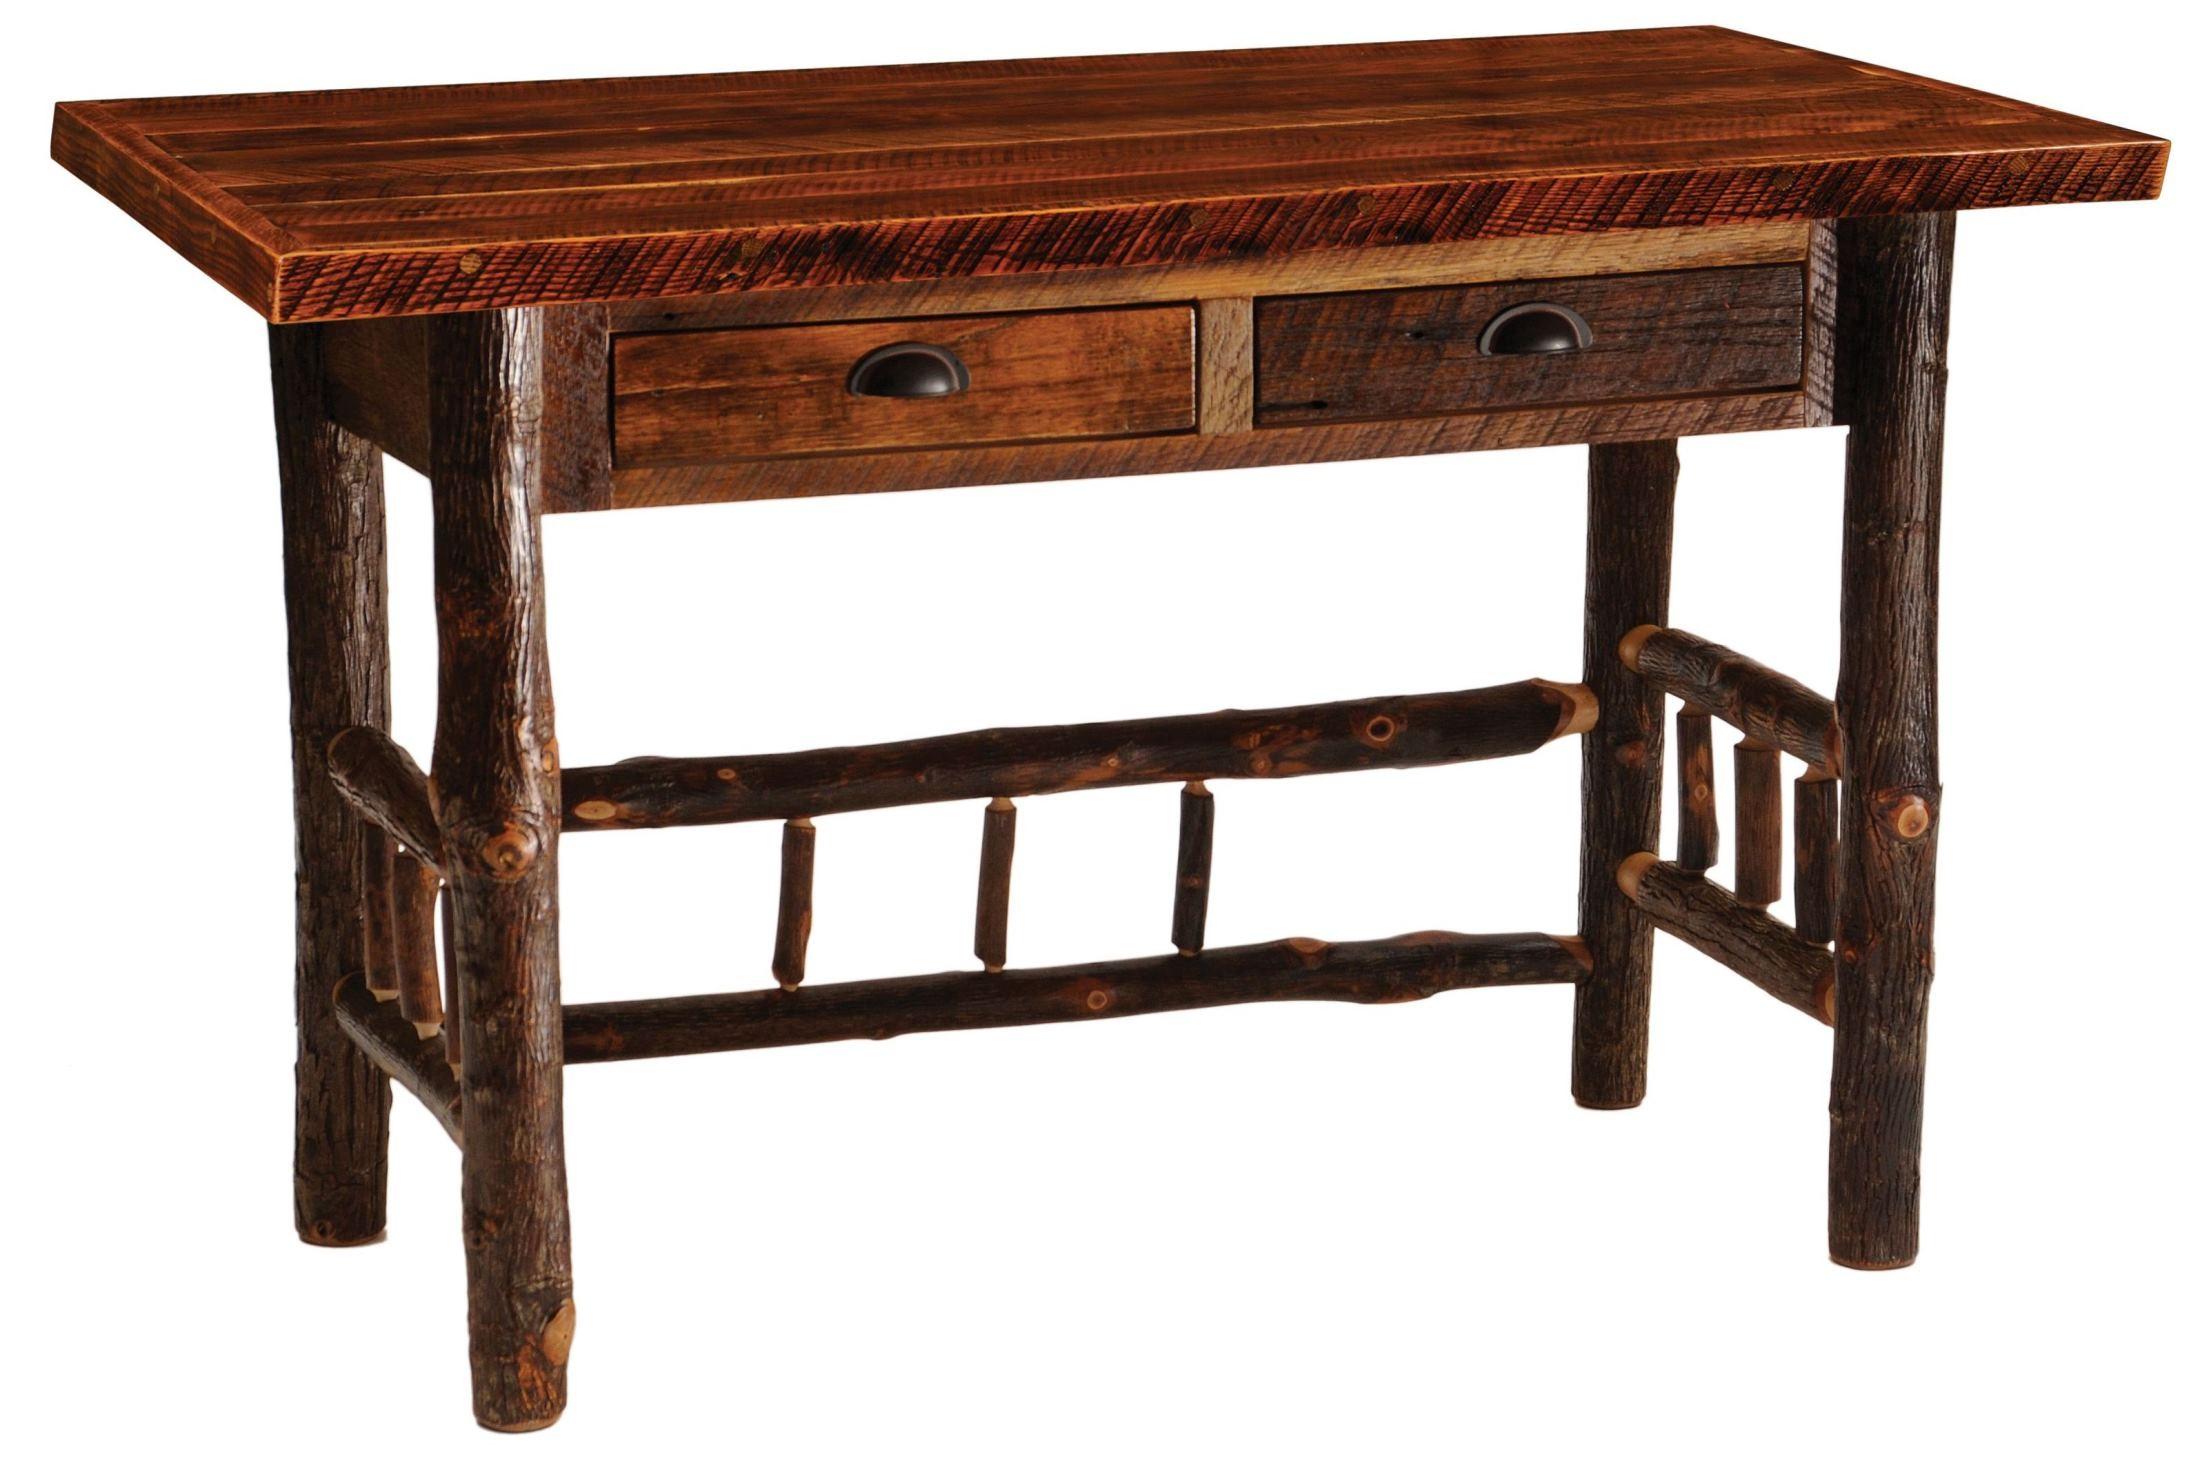 Barnwood drawers artisan top writing desk with hickory